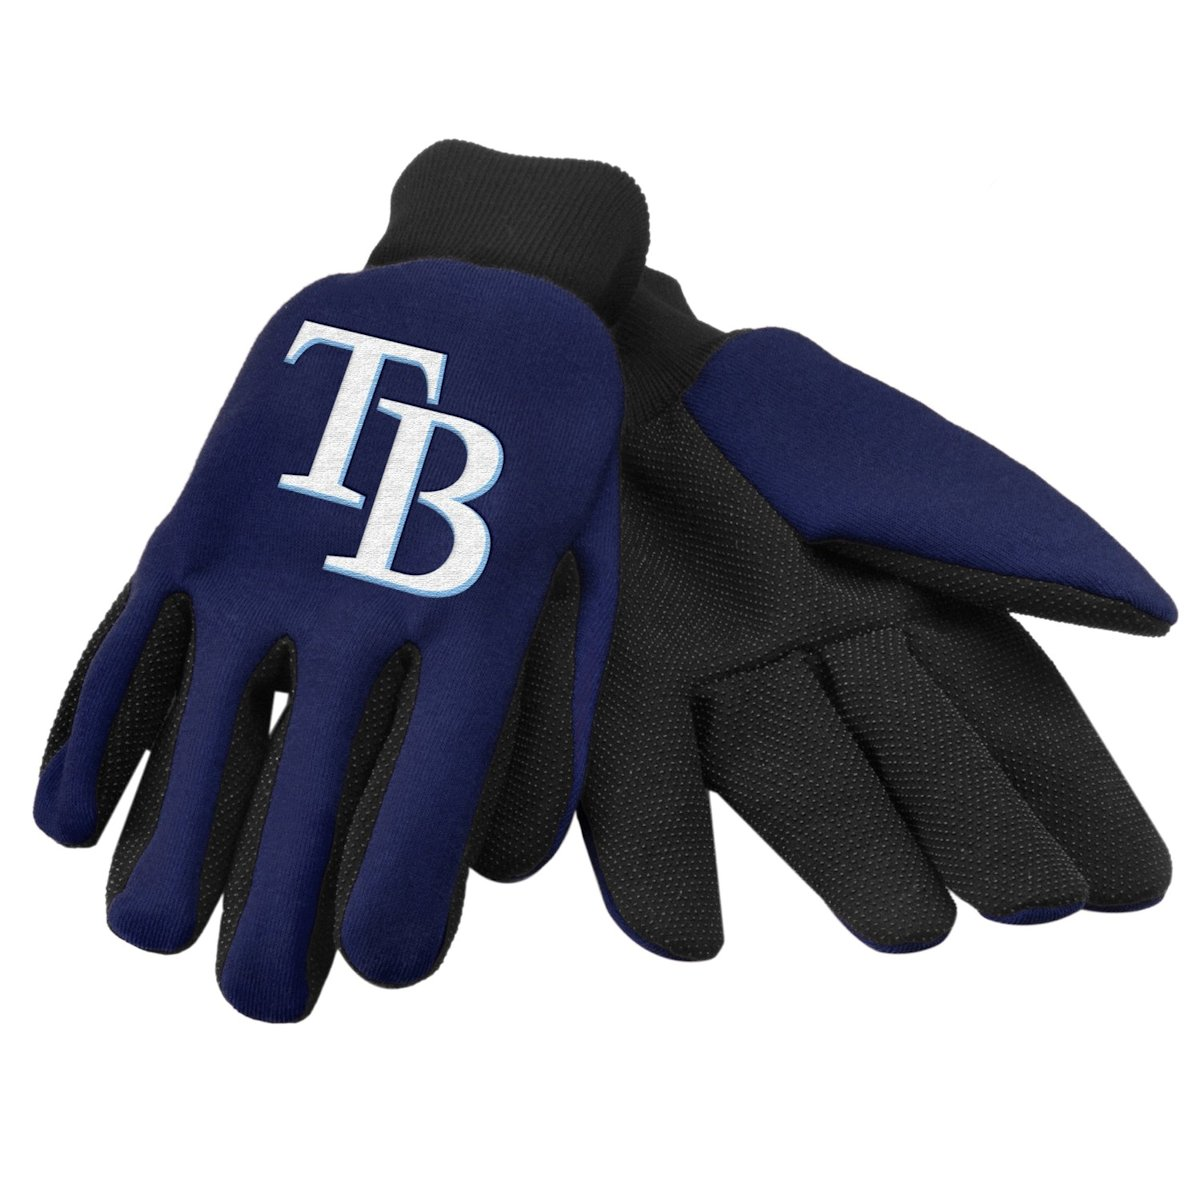 Sport In Gloves: MLB No Slip Sport Utility Work Gloves Choose Your Team